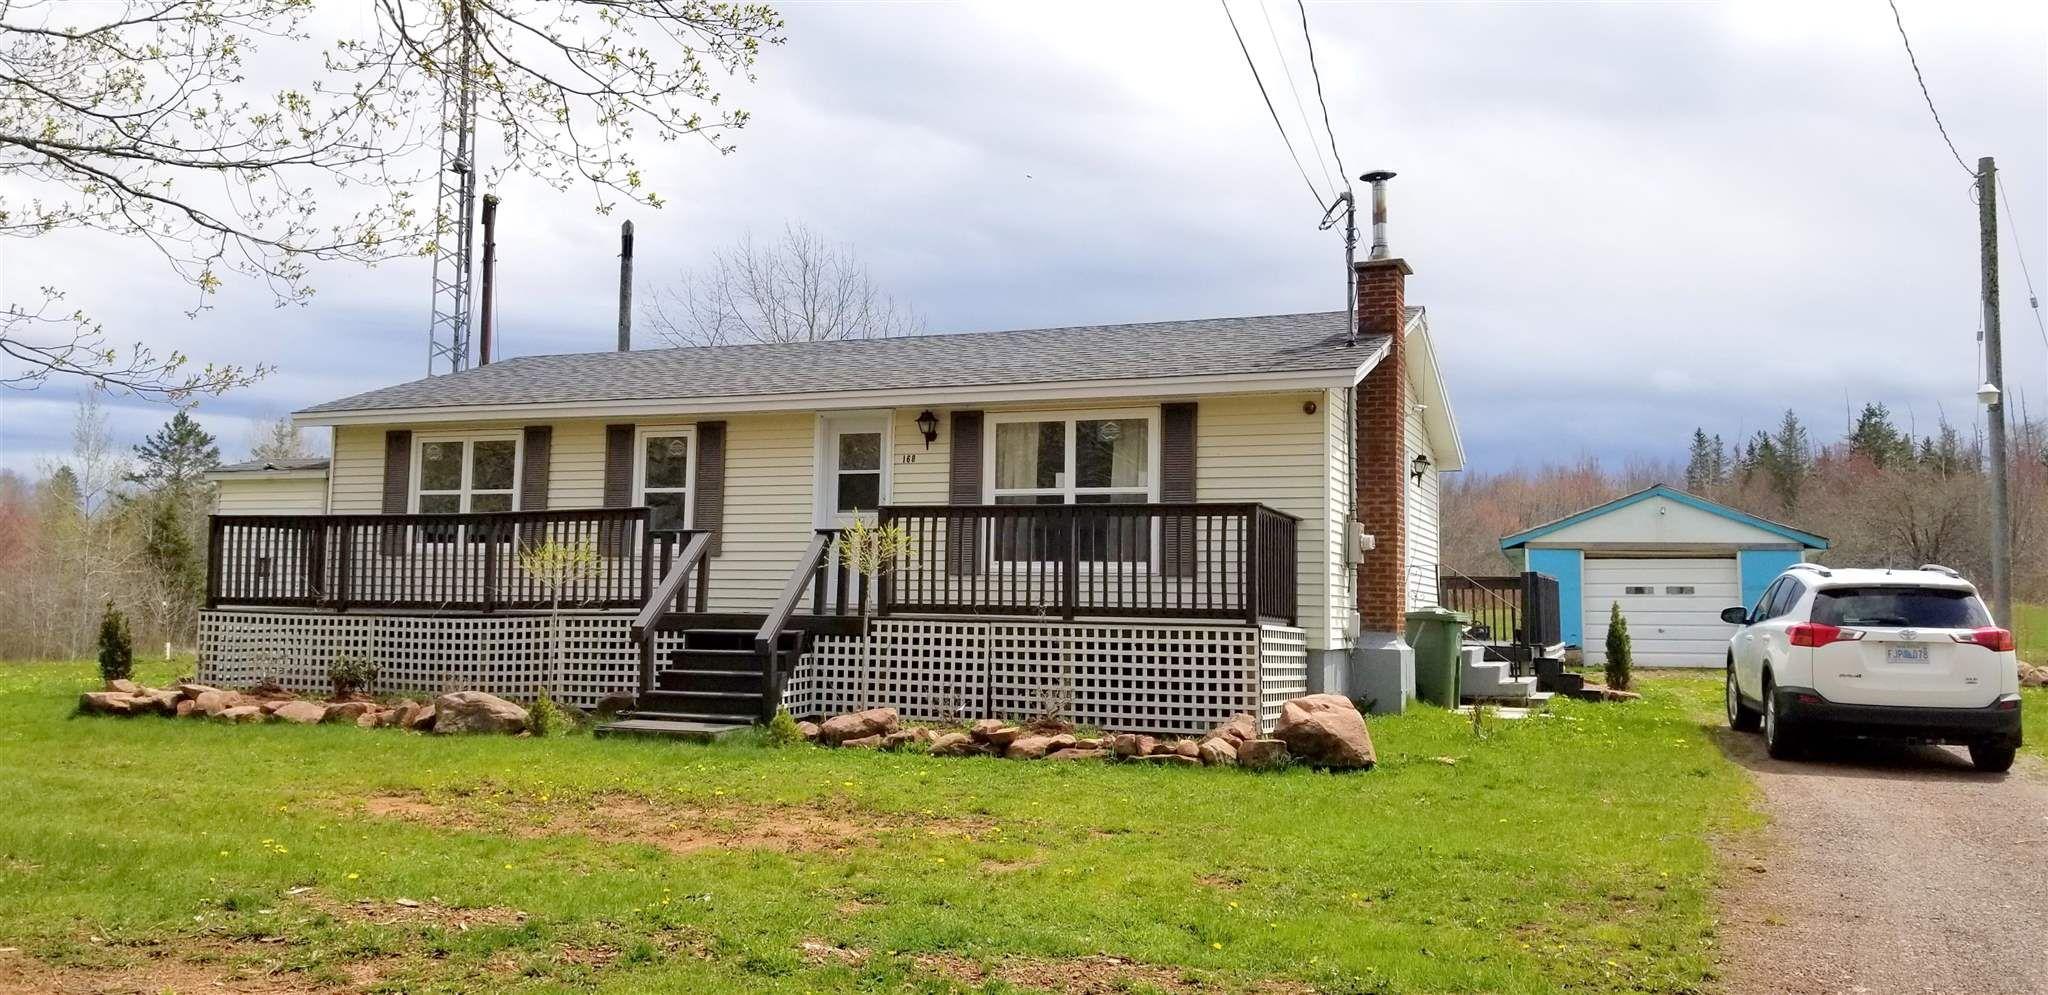 Main Photo: 168 Ripley Road in Truemanville: 101-Amherst,Brookdale,Warren Residential for sale (Northern Region)  : MLS®# 202111563